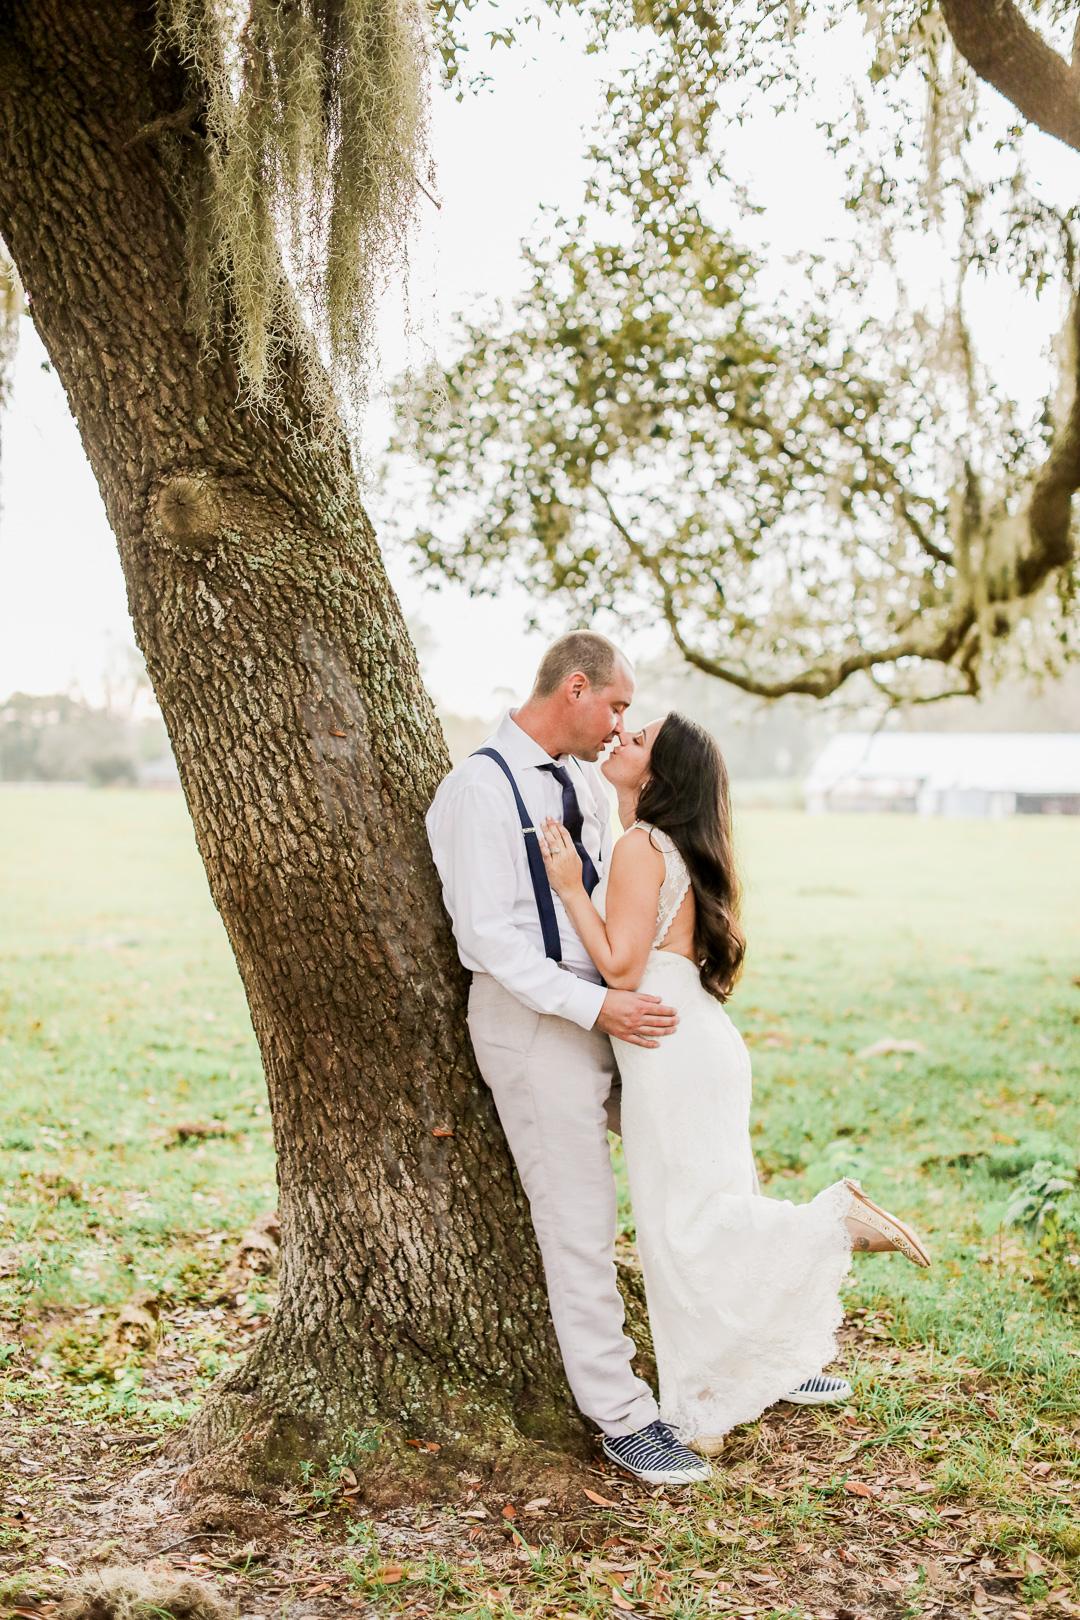 williams_family_newlywed-135.jpg